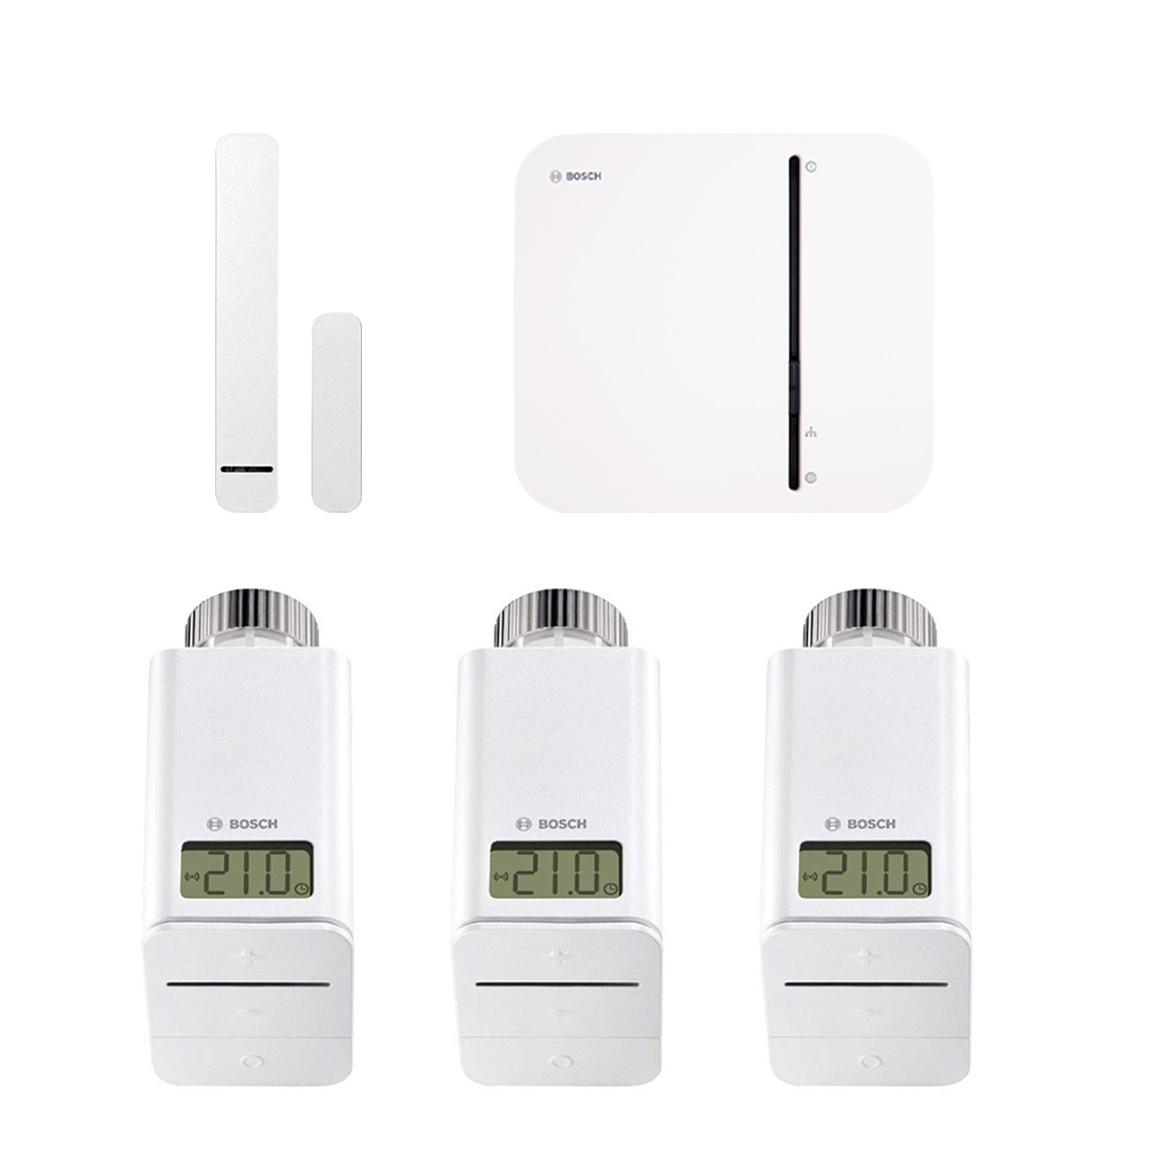 Bosch Smart Home - Starter Set Heizung + Tür-/Fensterkontakt + gratis Twinguard + Twist